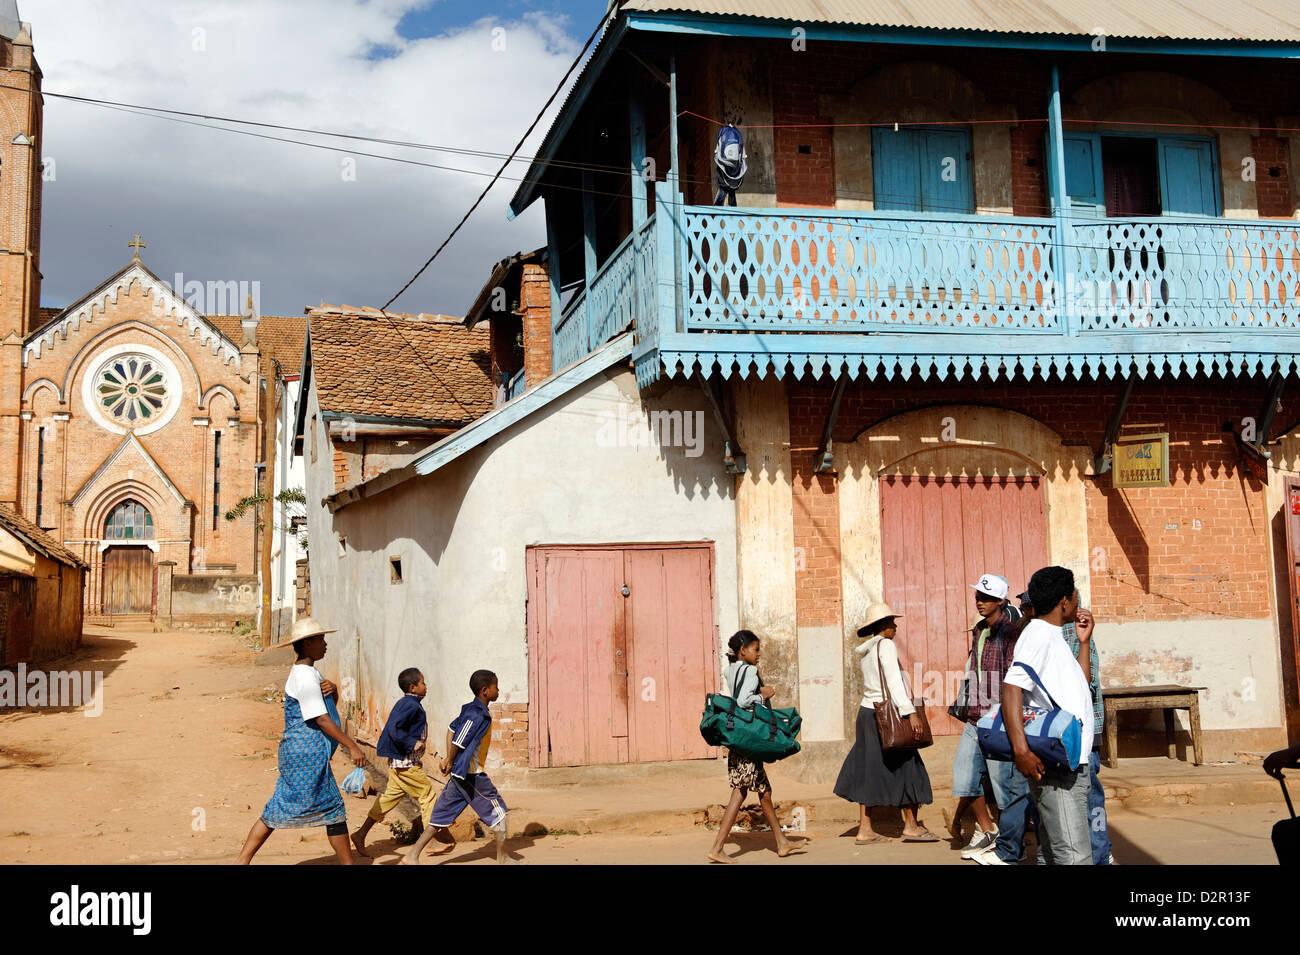 La rue principale, Ambalavao, partie sud des hautes terres centrales, Madagascar, Afrique Photo Stock